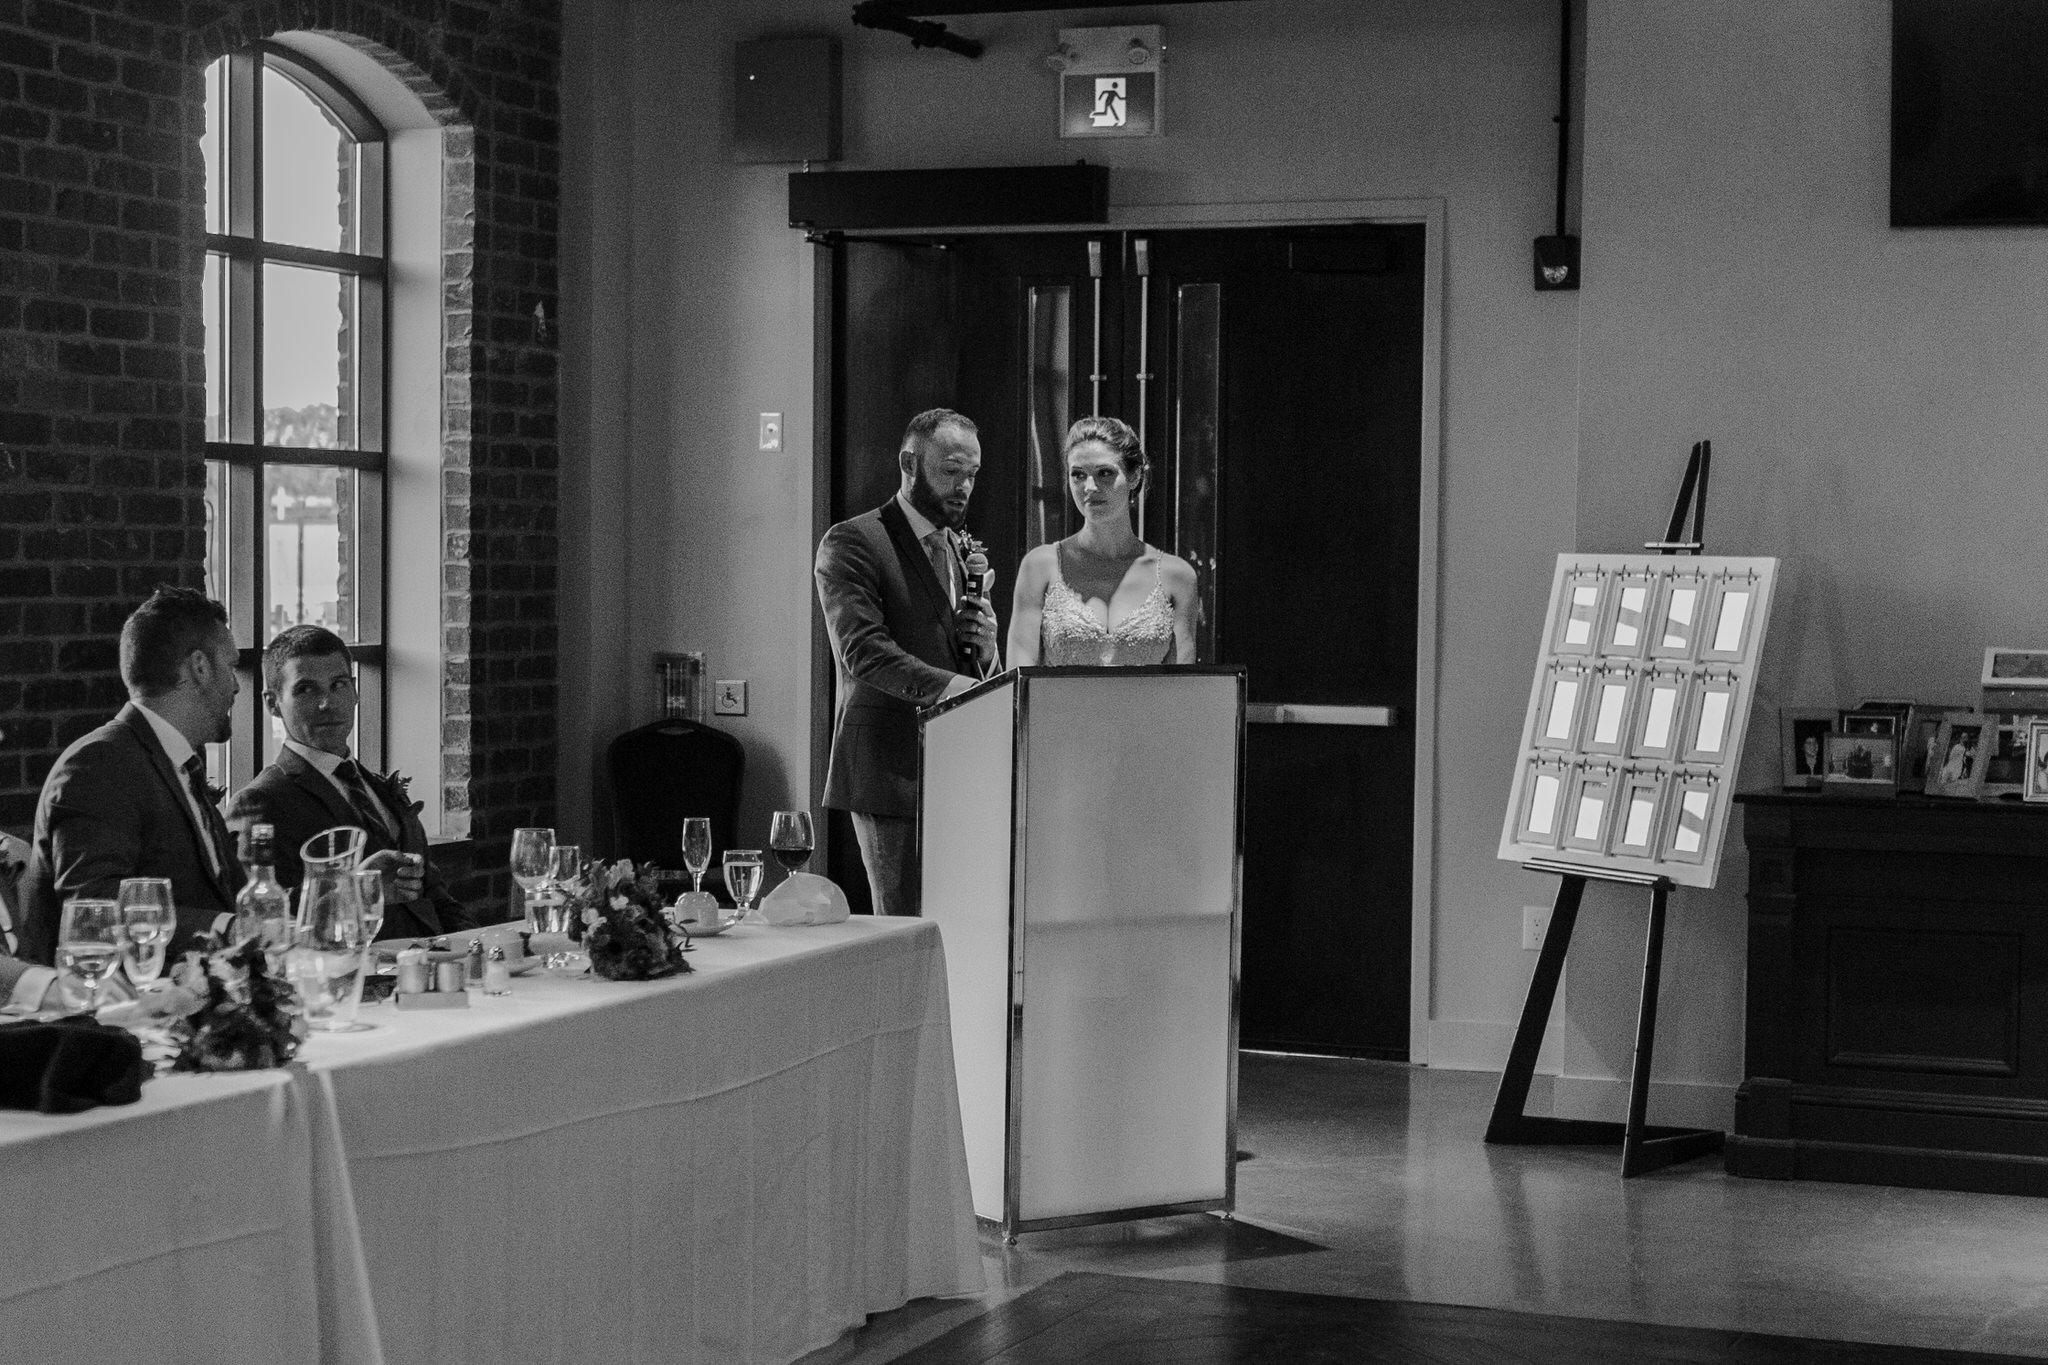 Brock Street Brewery Wedding - bride and groom speech